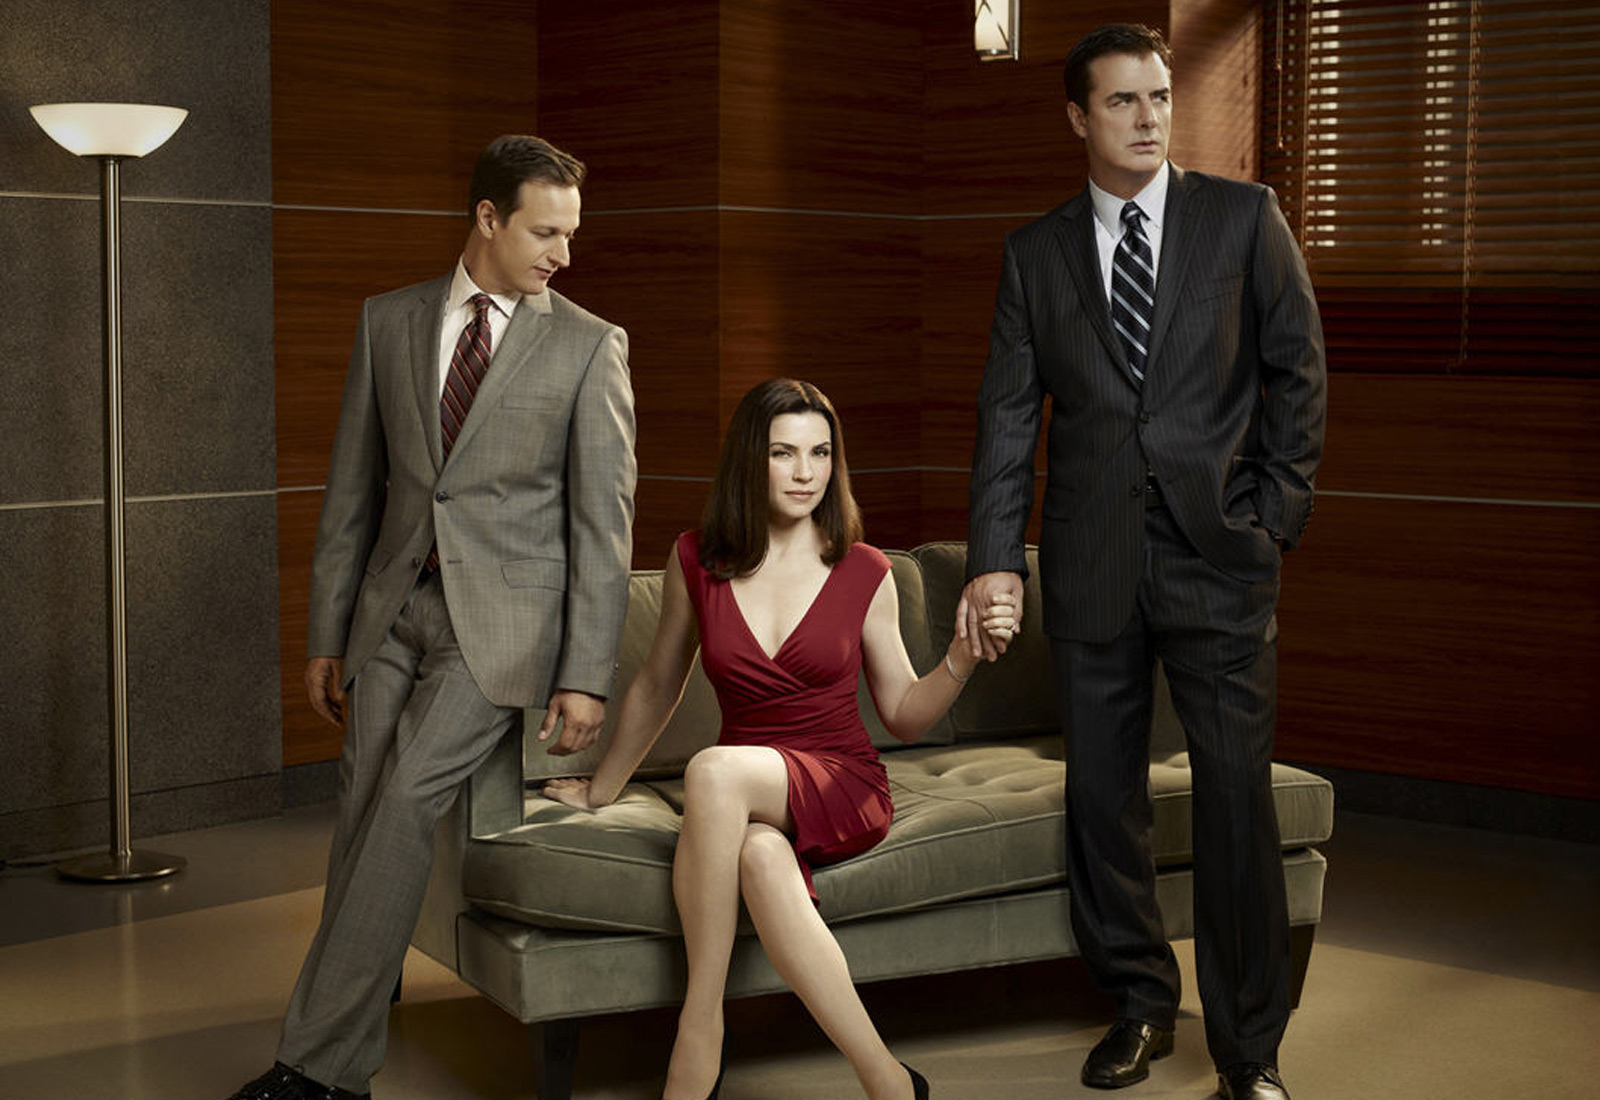 Watch The Good Wife Season 1 Prime Video